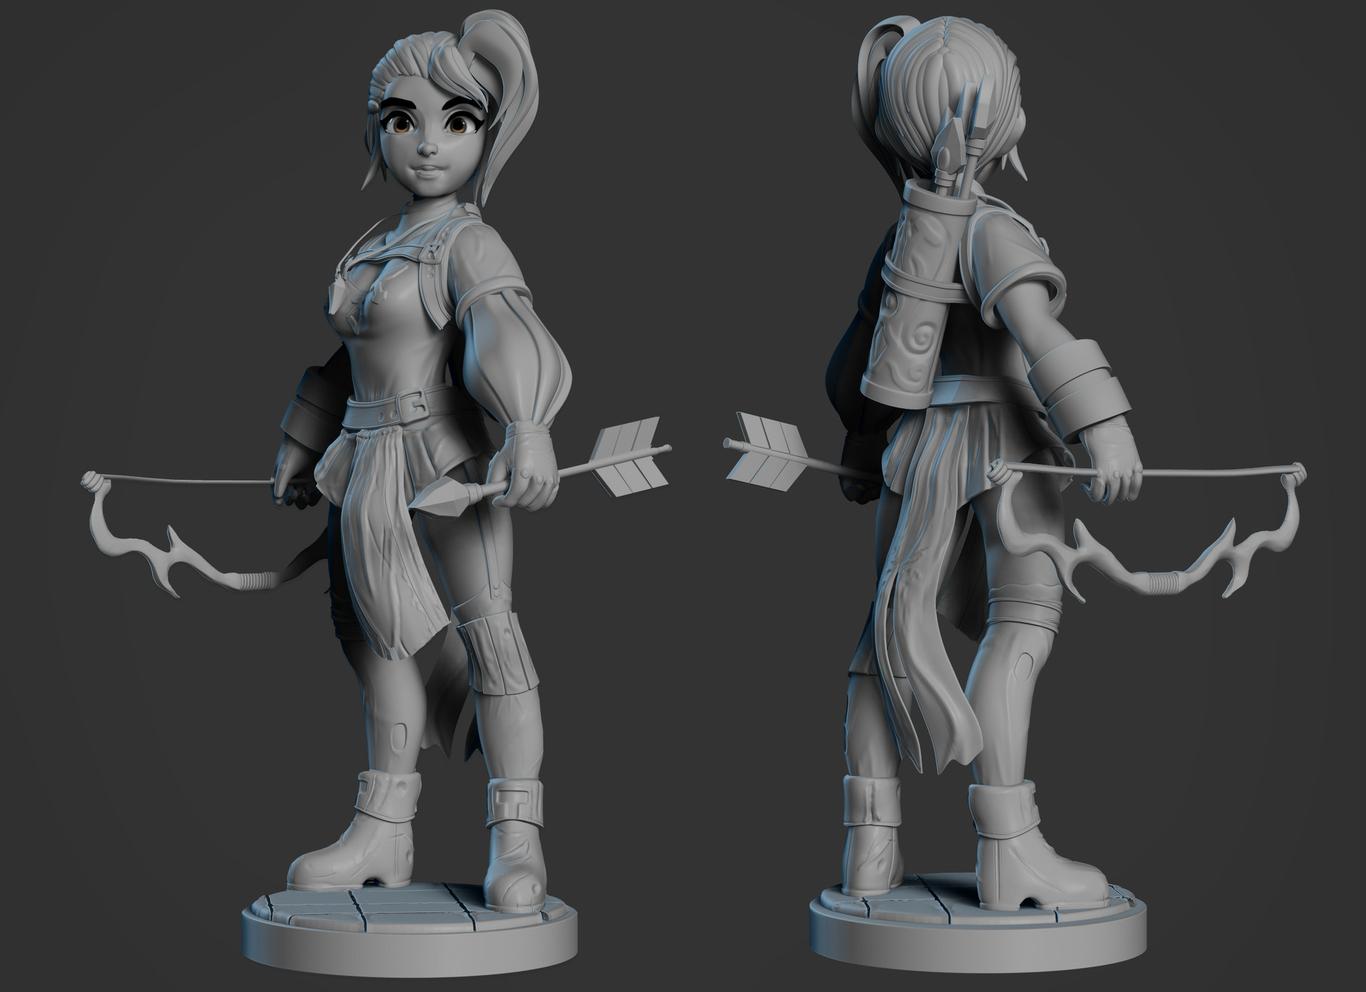 3d girl model character design archer